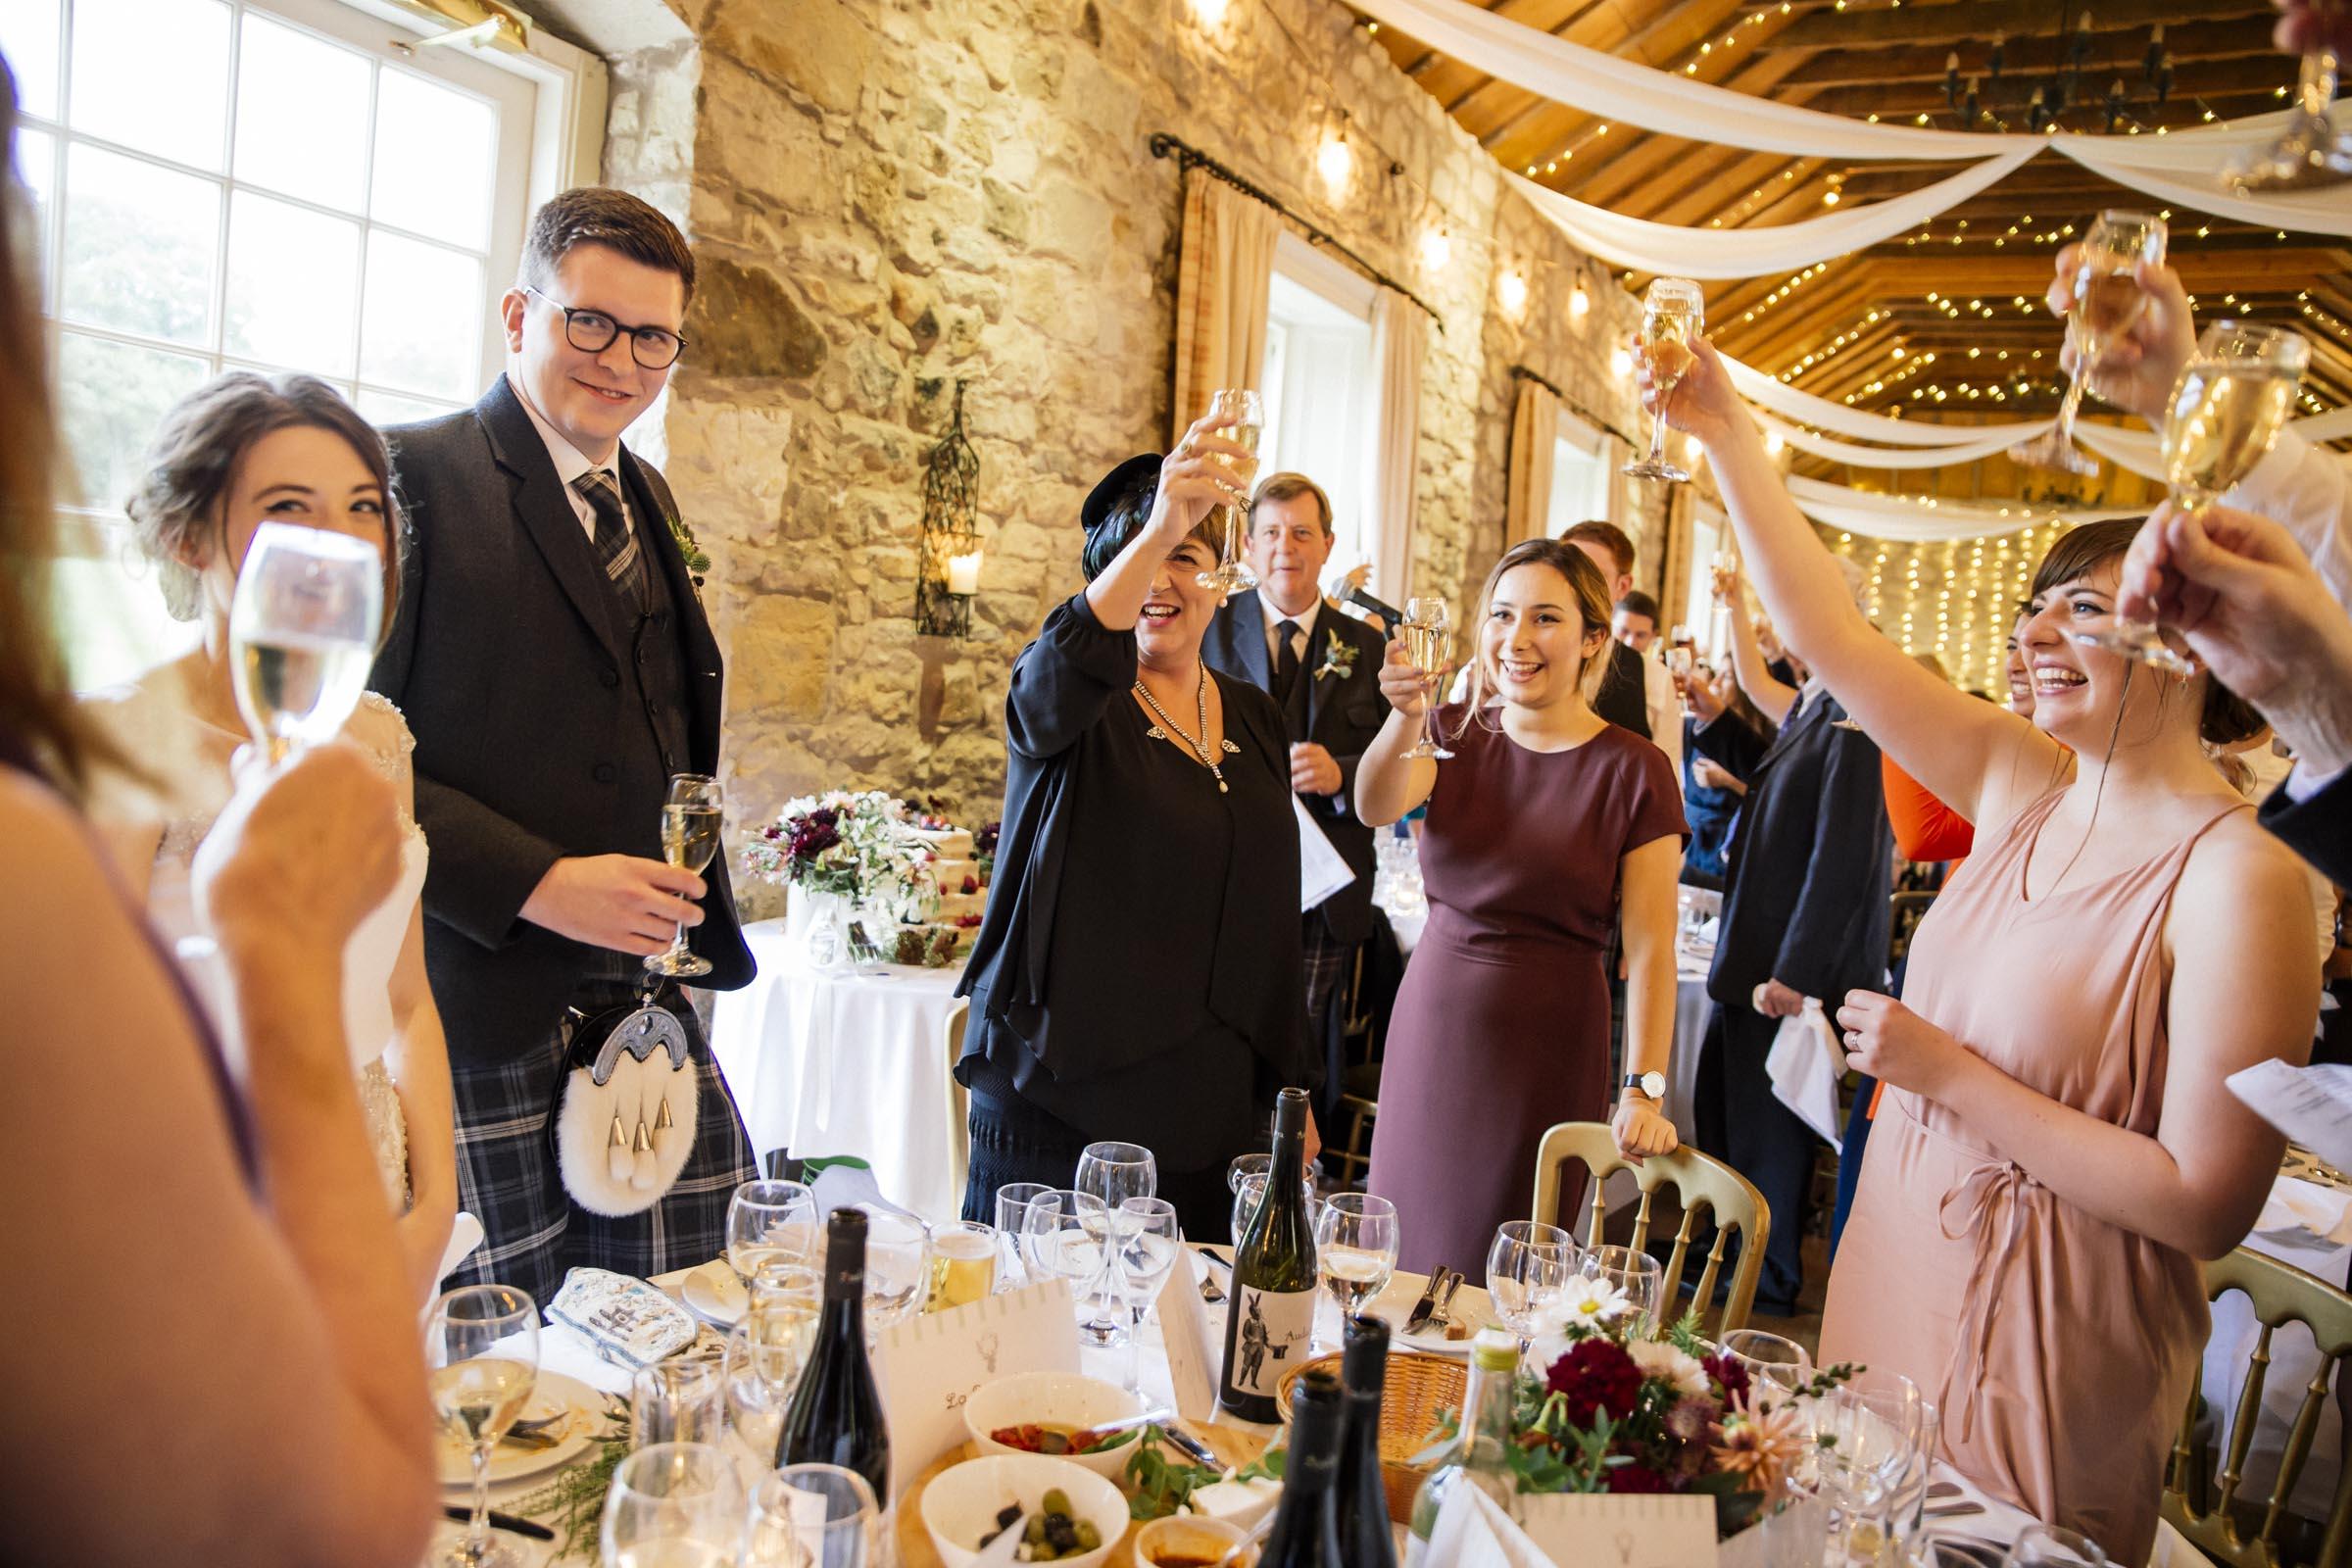 aScottish Wedding at Kirknewton Stables by Alternative Edinburgh Wedding Photographer - Ceranna Photography